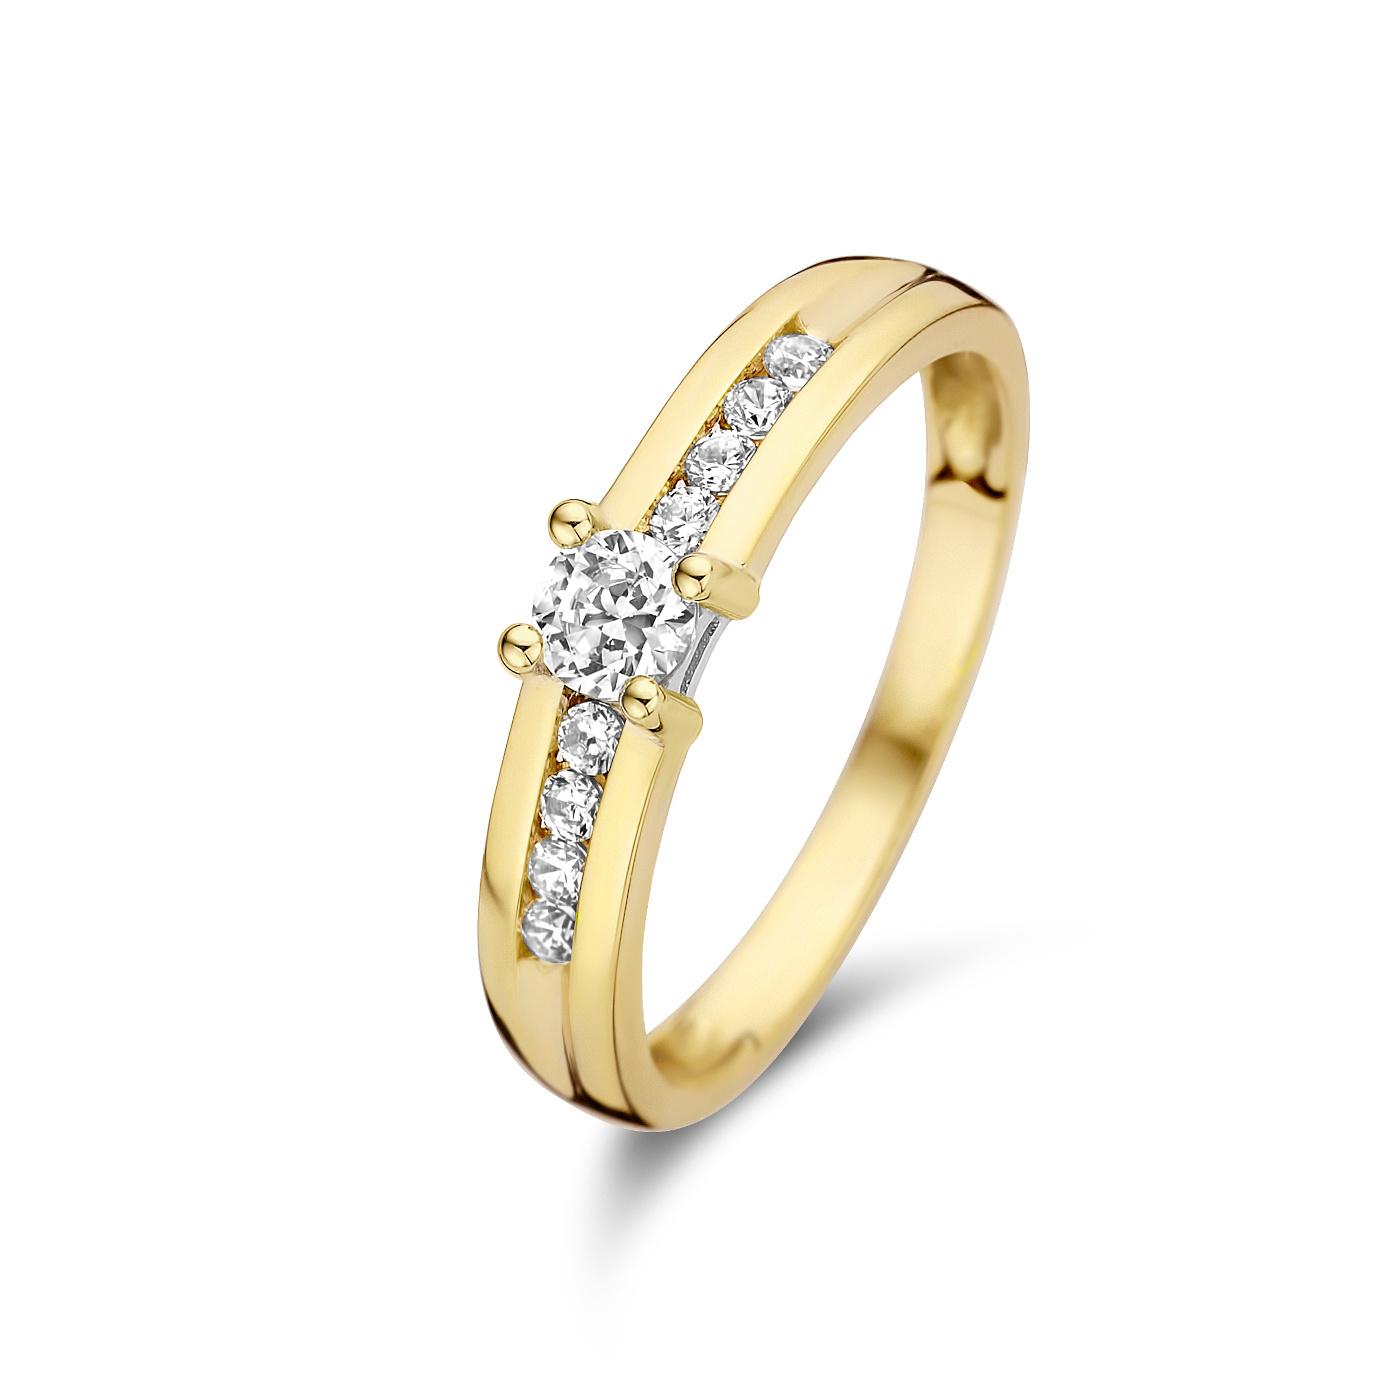 Isabel Bernard Le Marais Estée 14 karat gold ring with zirconia